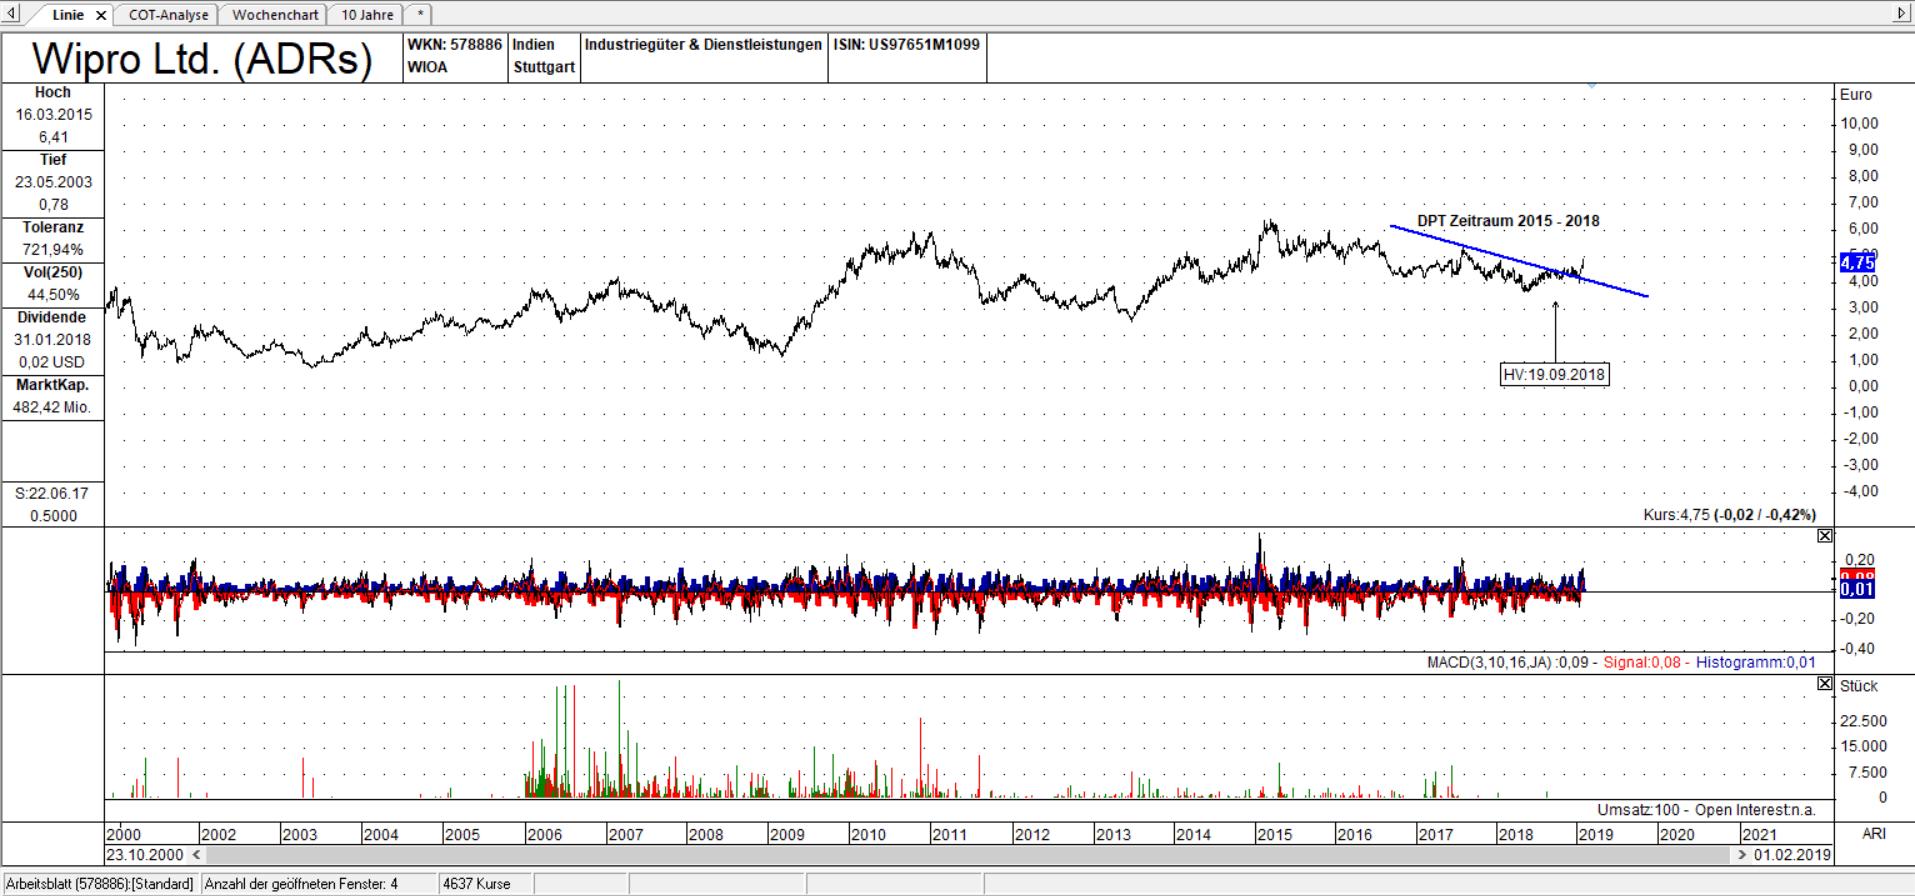 Wipro Linienchart, linear: Aktie notiert oberhalb der DPT Linie